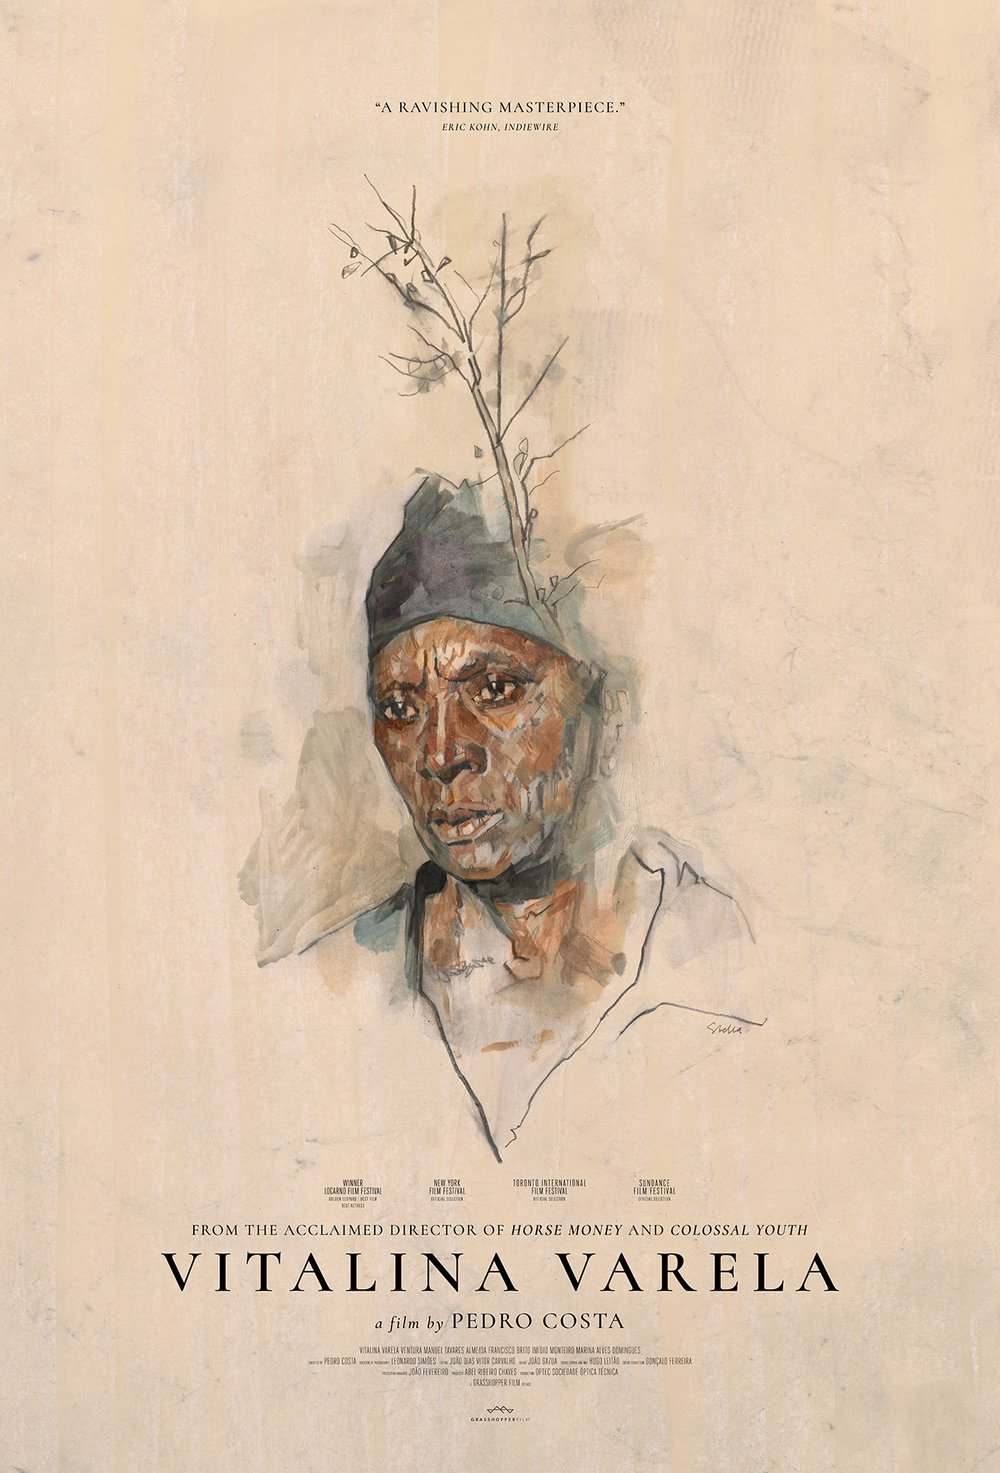 Poster for Vitalina Varela